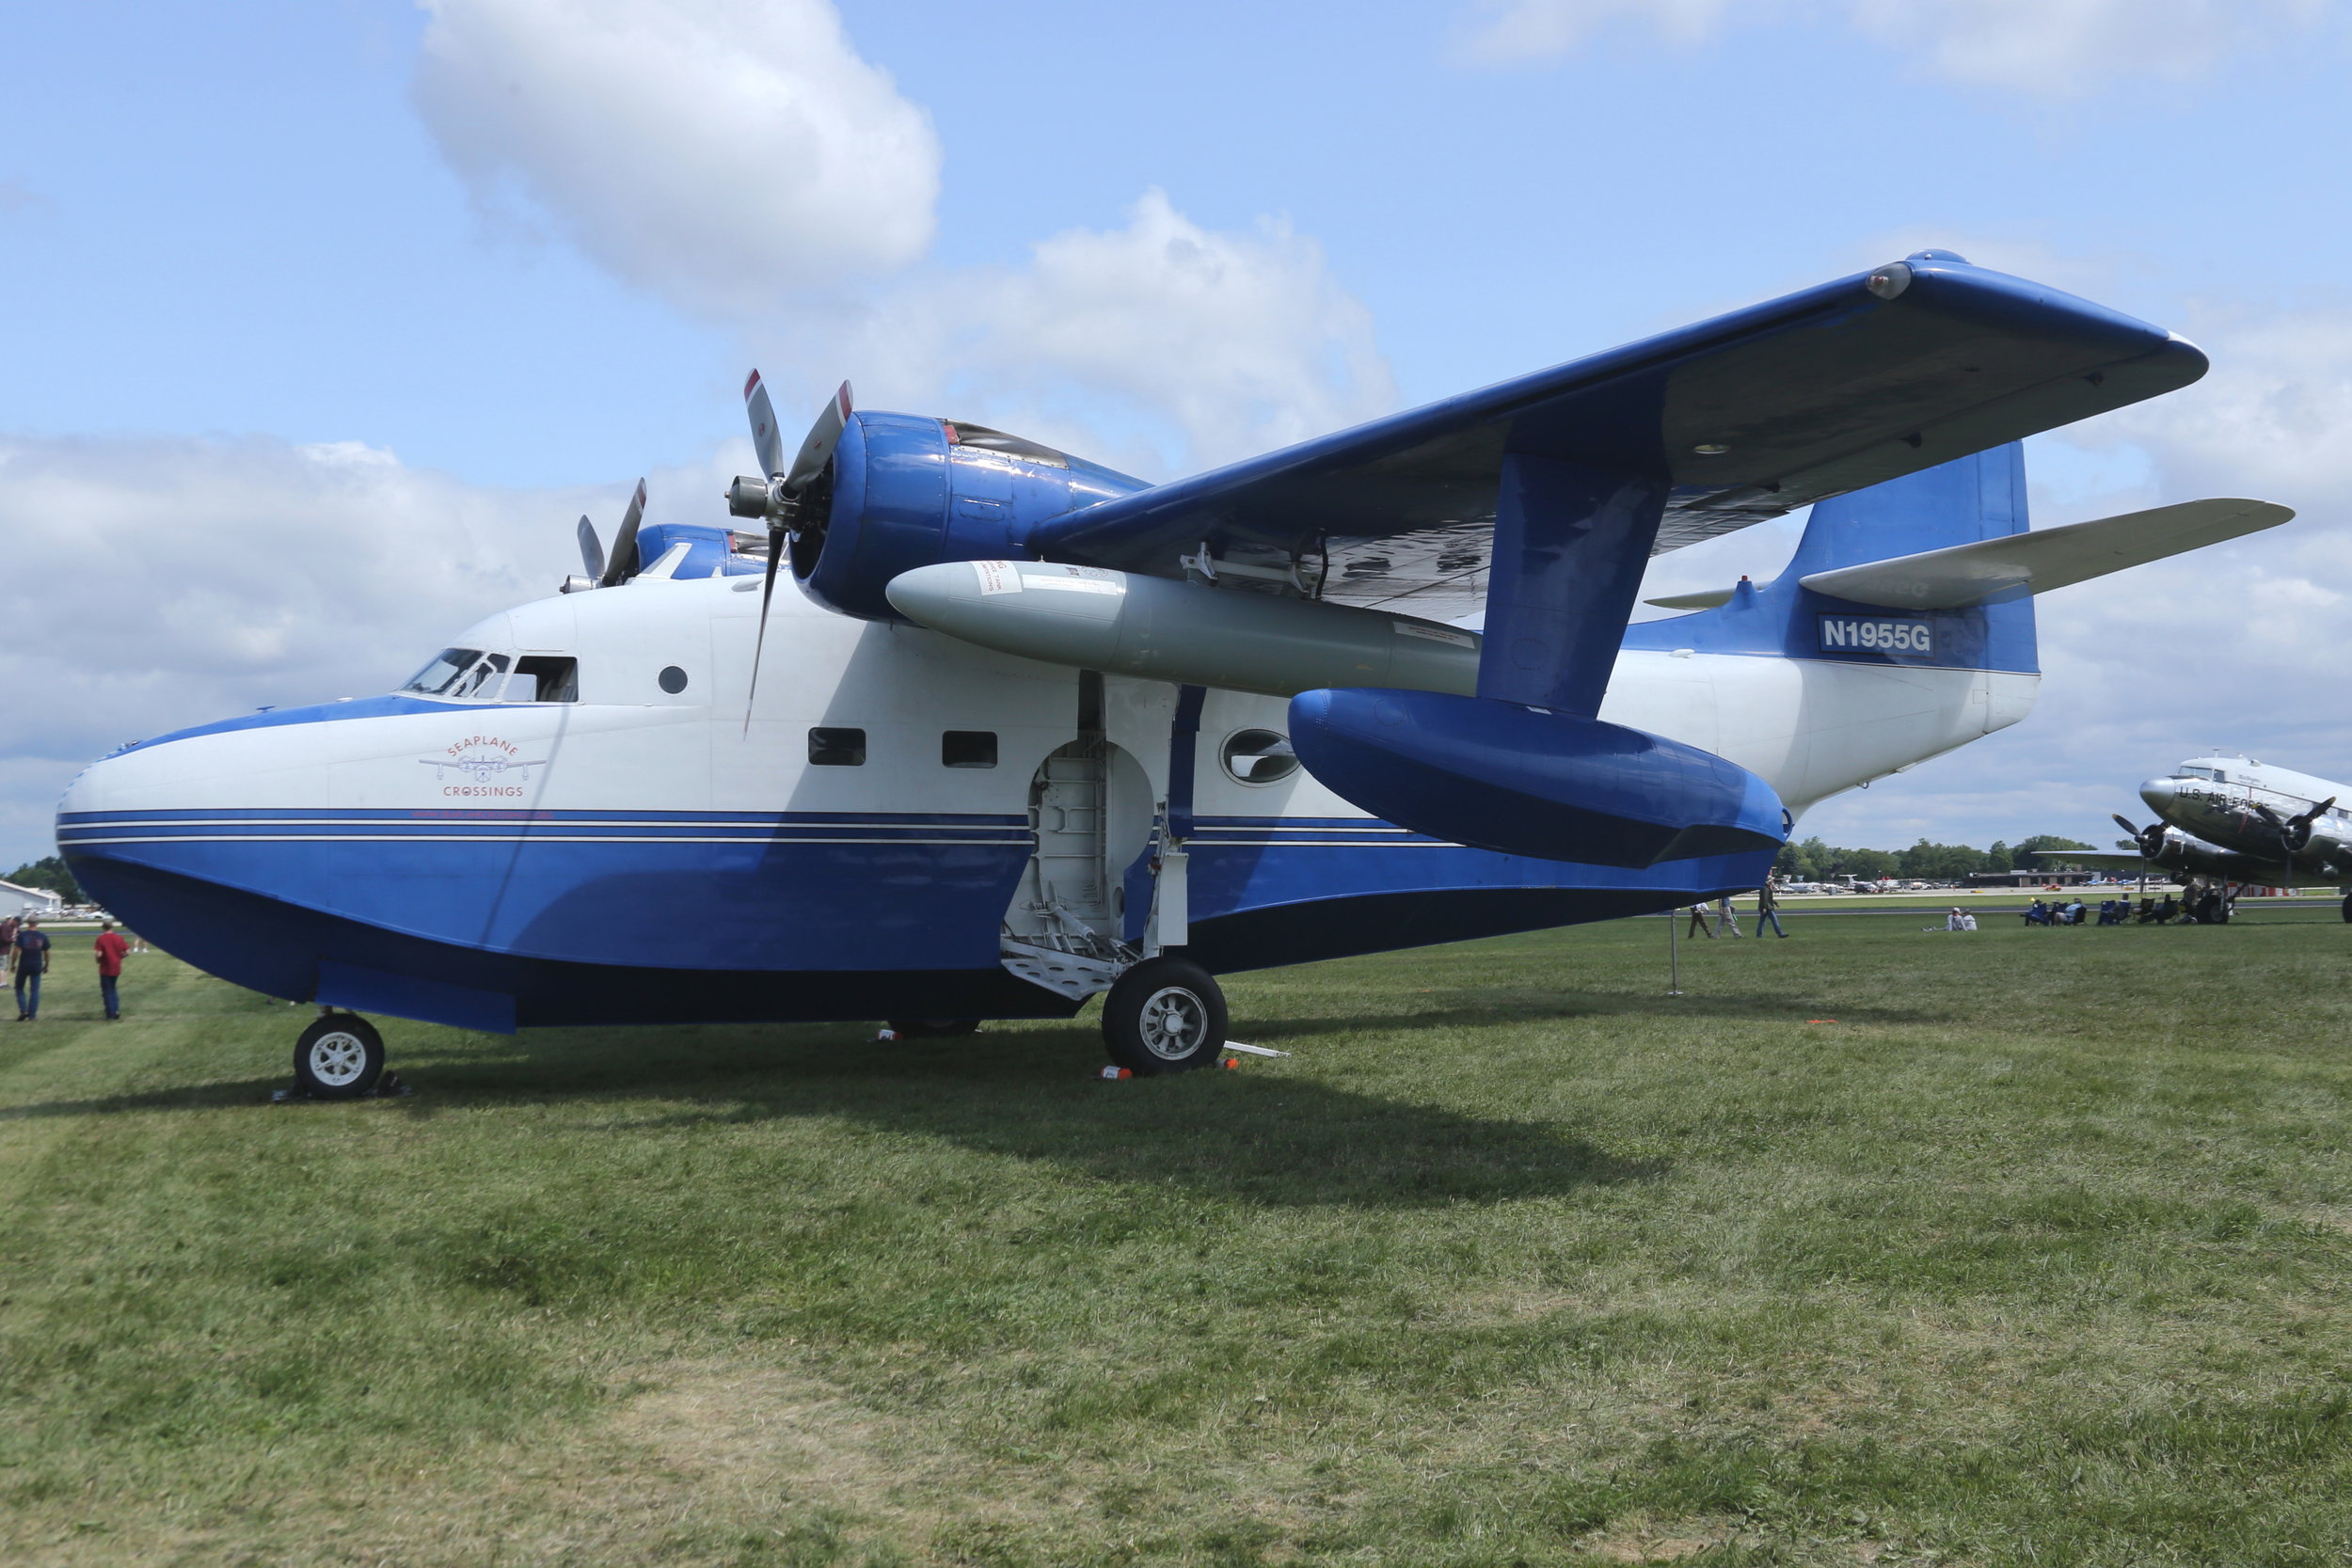 N1955G Stargazer Aero Grumman Albatross taken at Oshkosh 27th July 2018 by John Wood